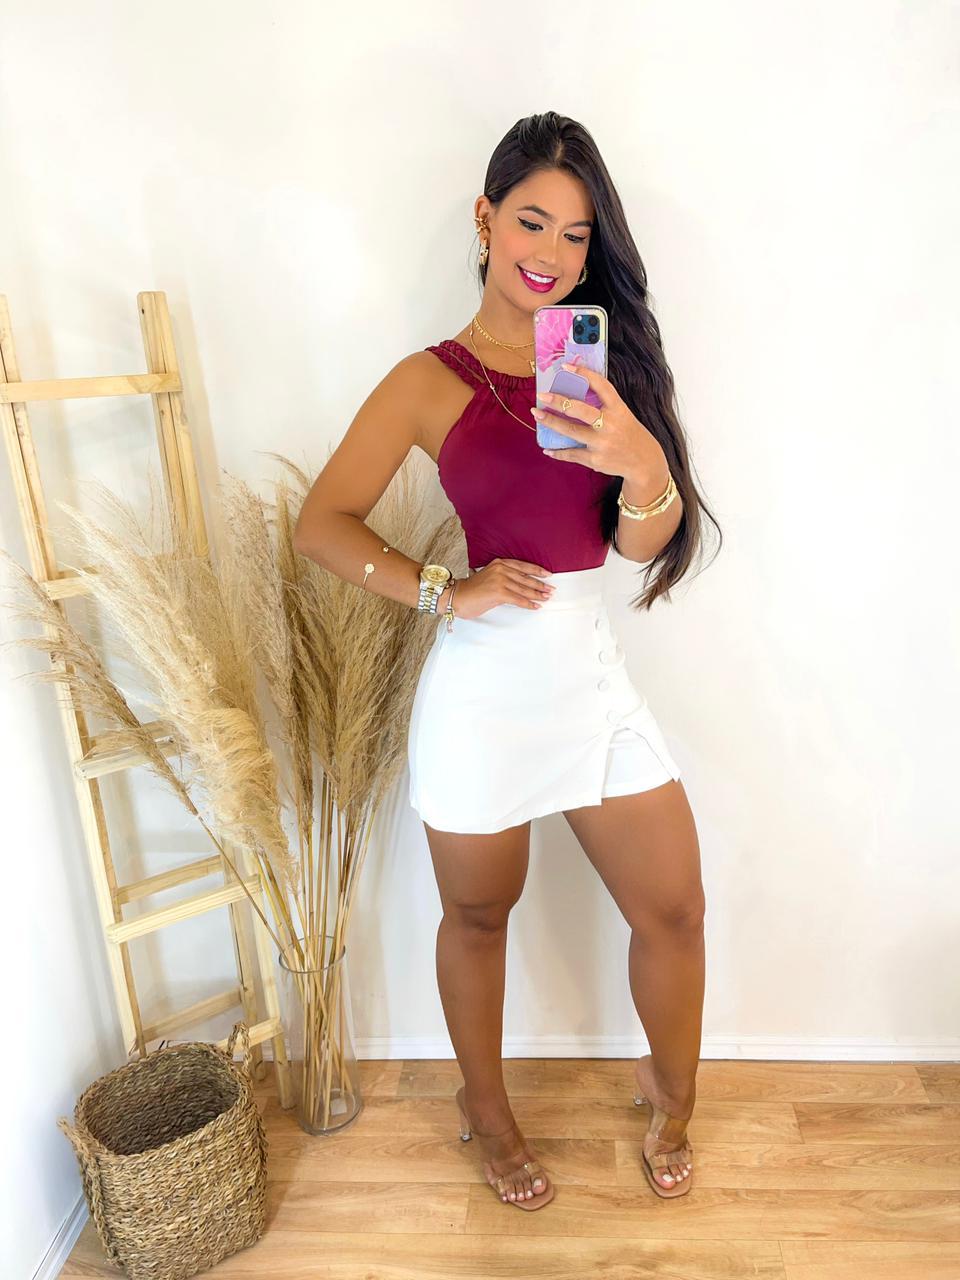 Conjunto Shorts saia Branco Com Body Bordo Poliamida